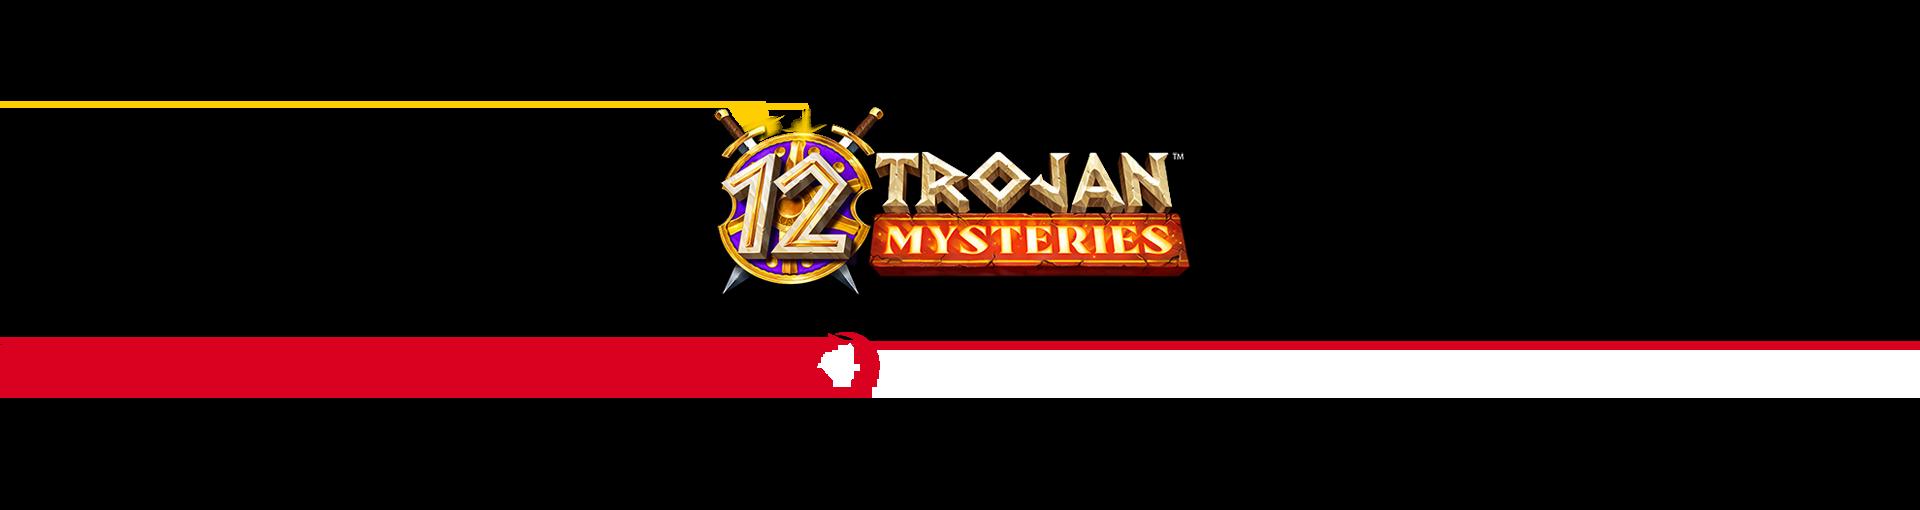 12_trojan_Yggdrasil-UpcomingGame-Logo-Template-1920x510px